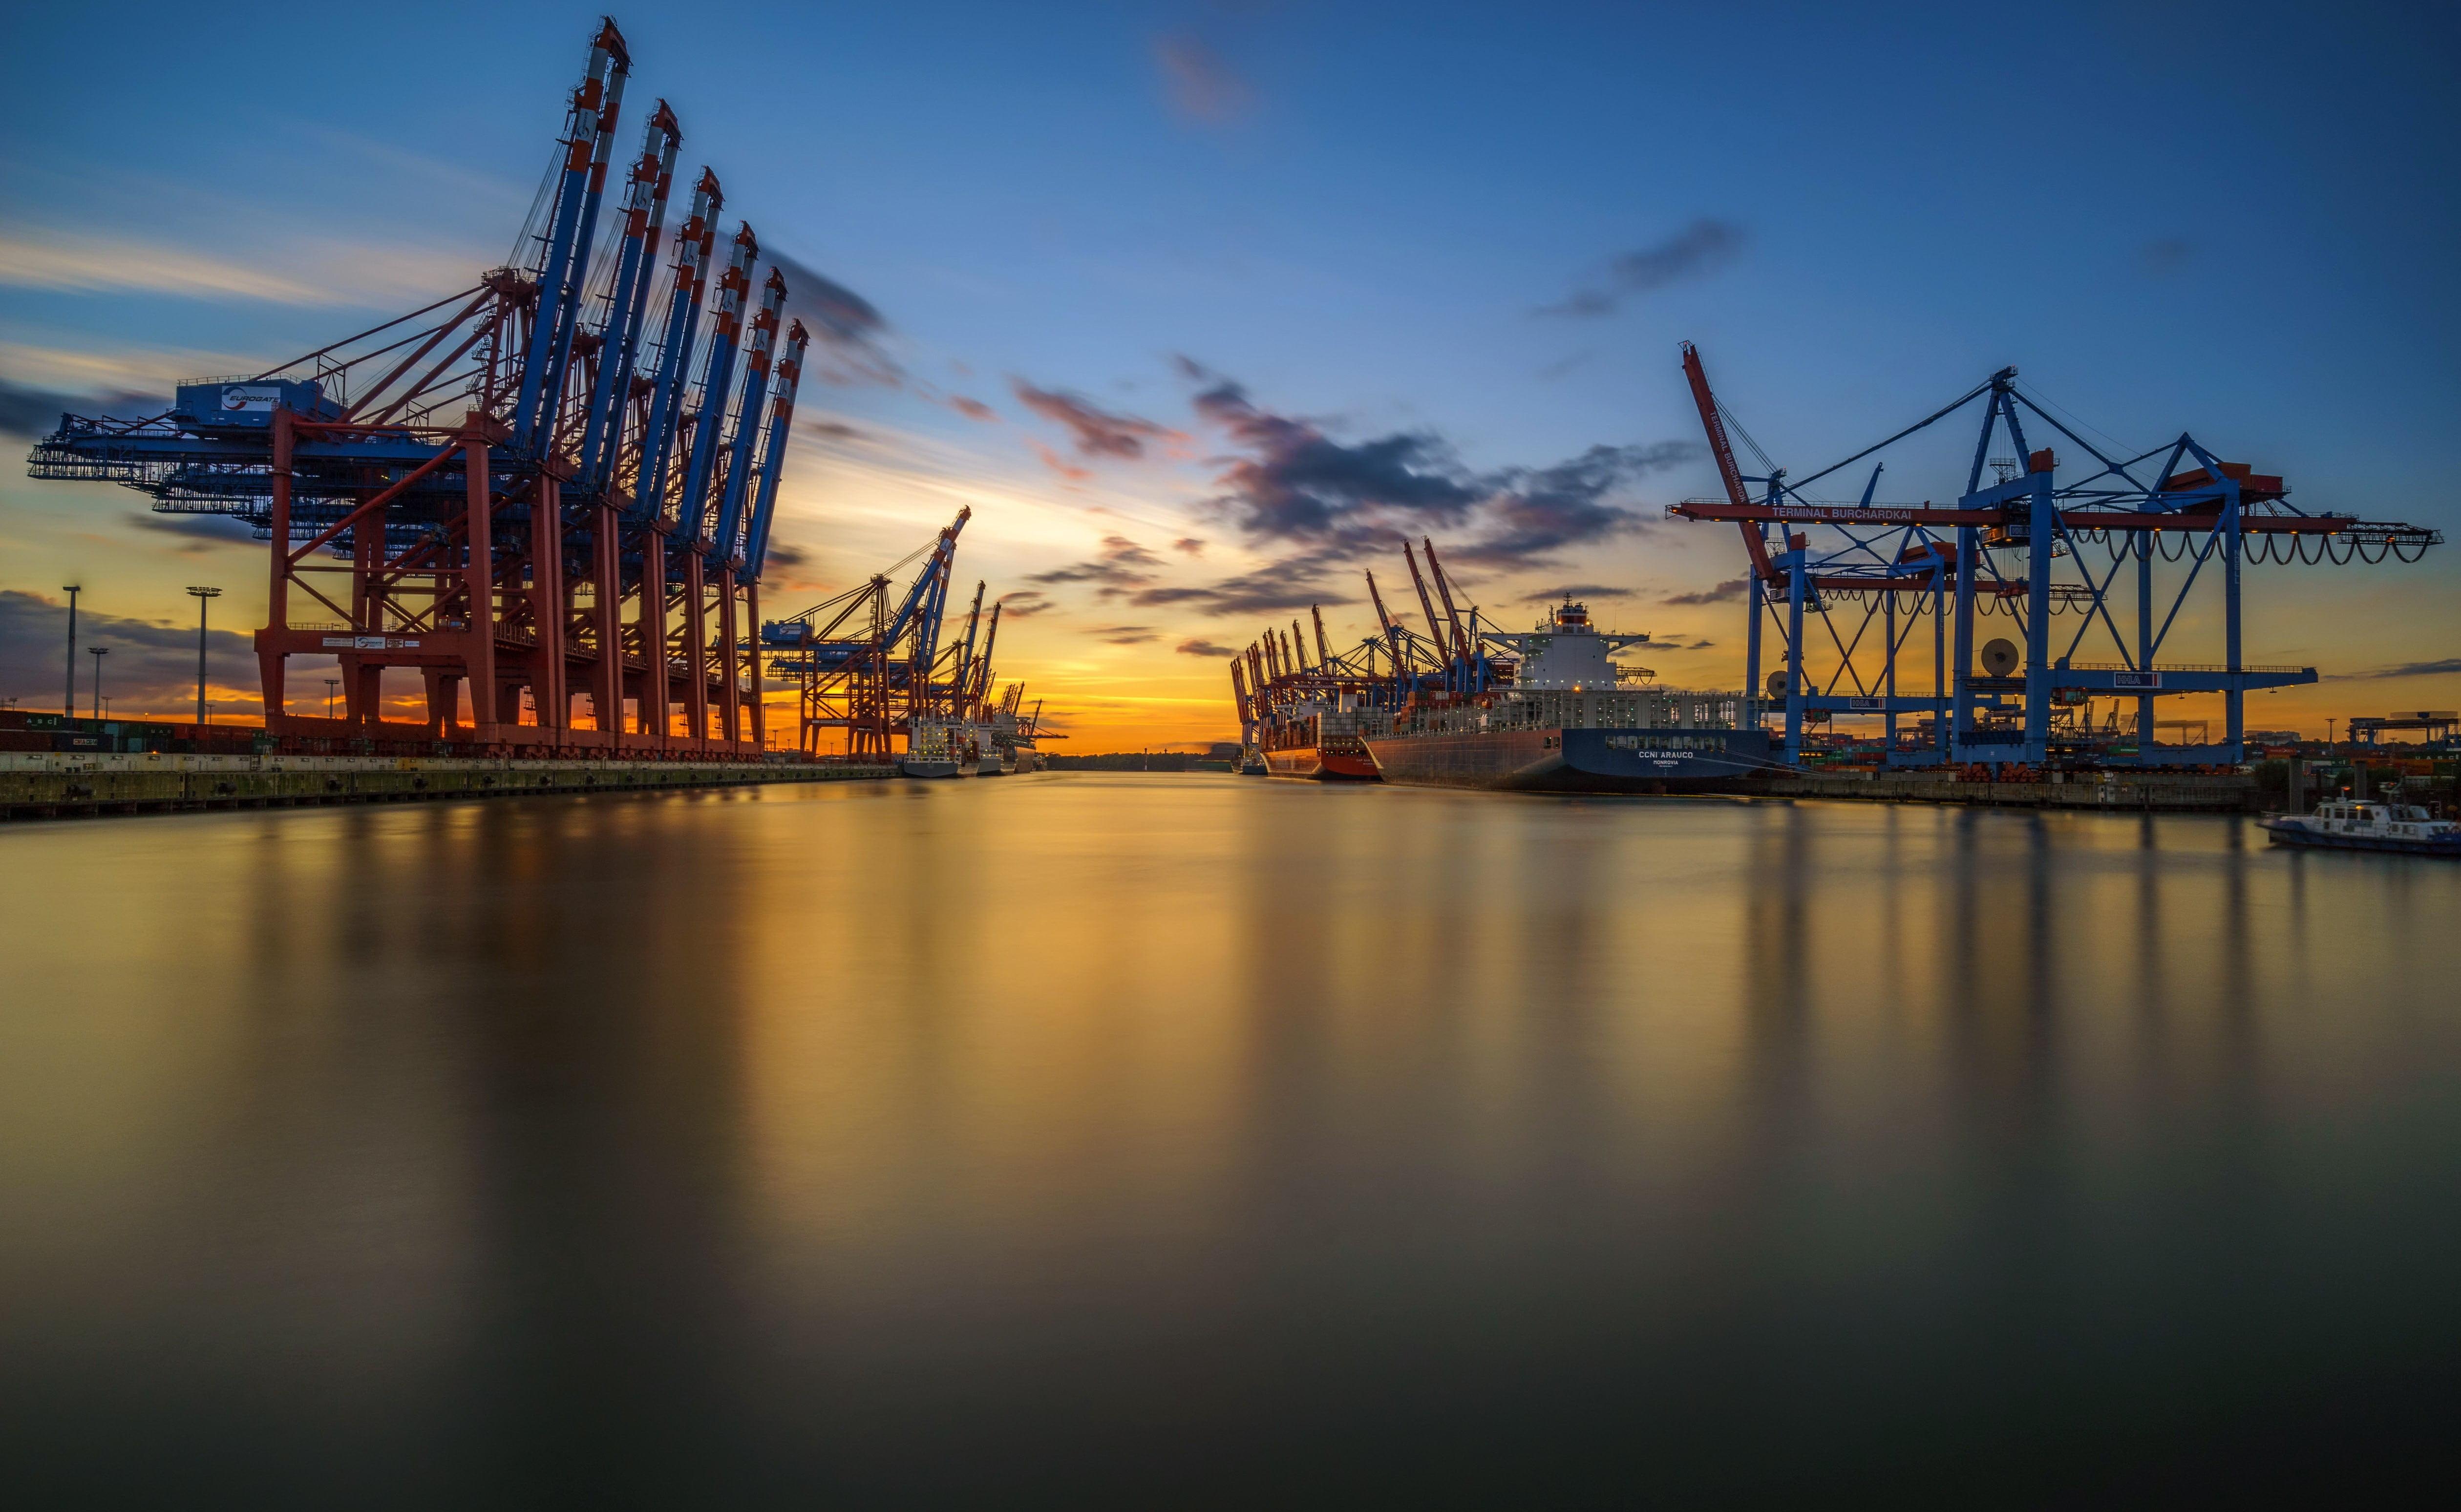 Gray metal building structure Hamburg harbor cranes machine 5038x3096